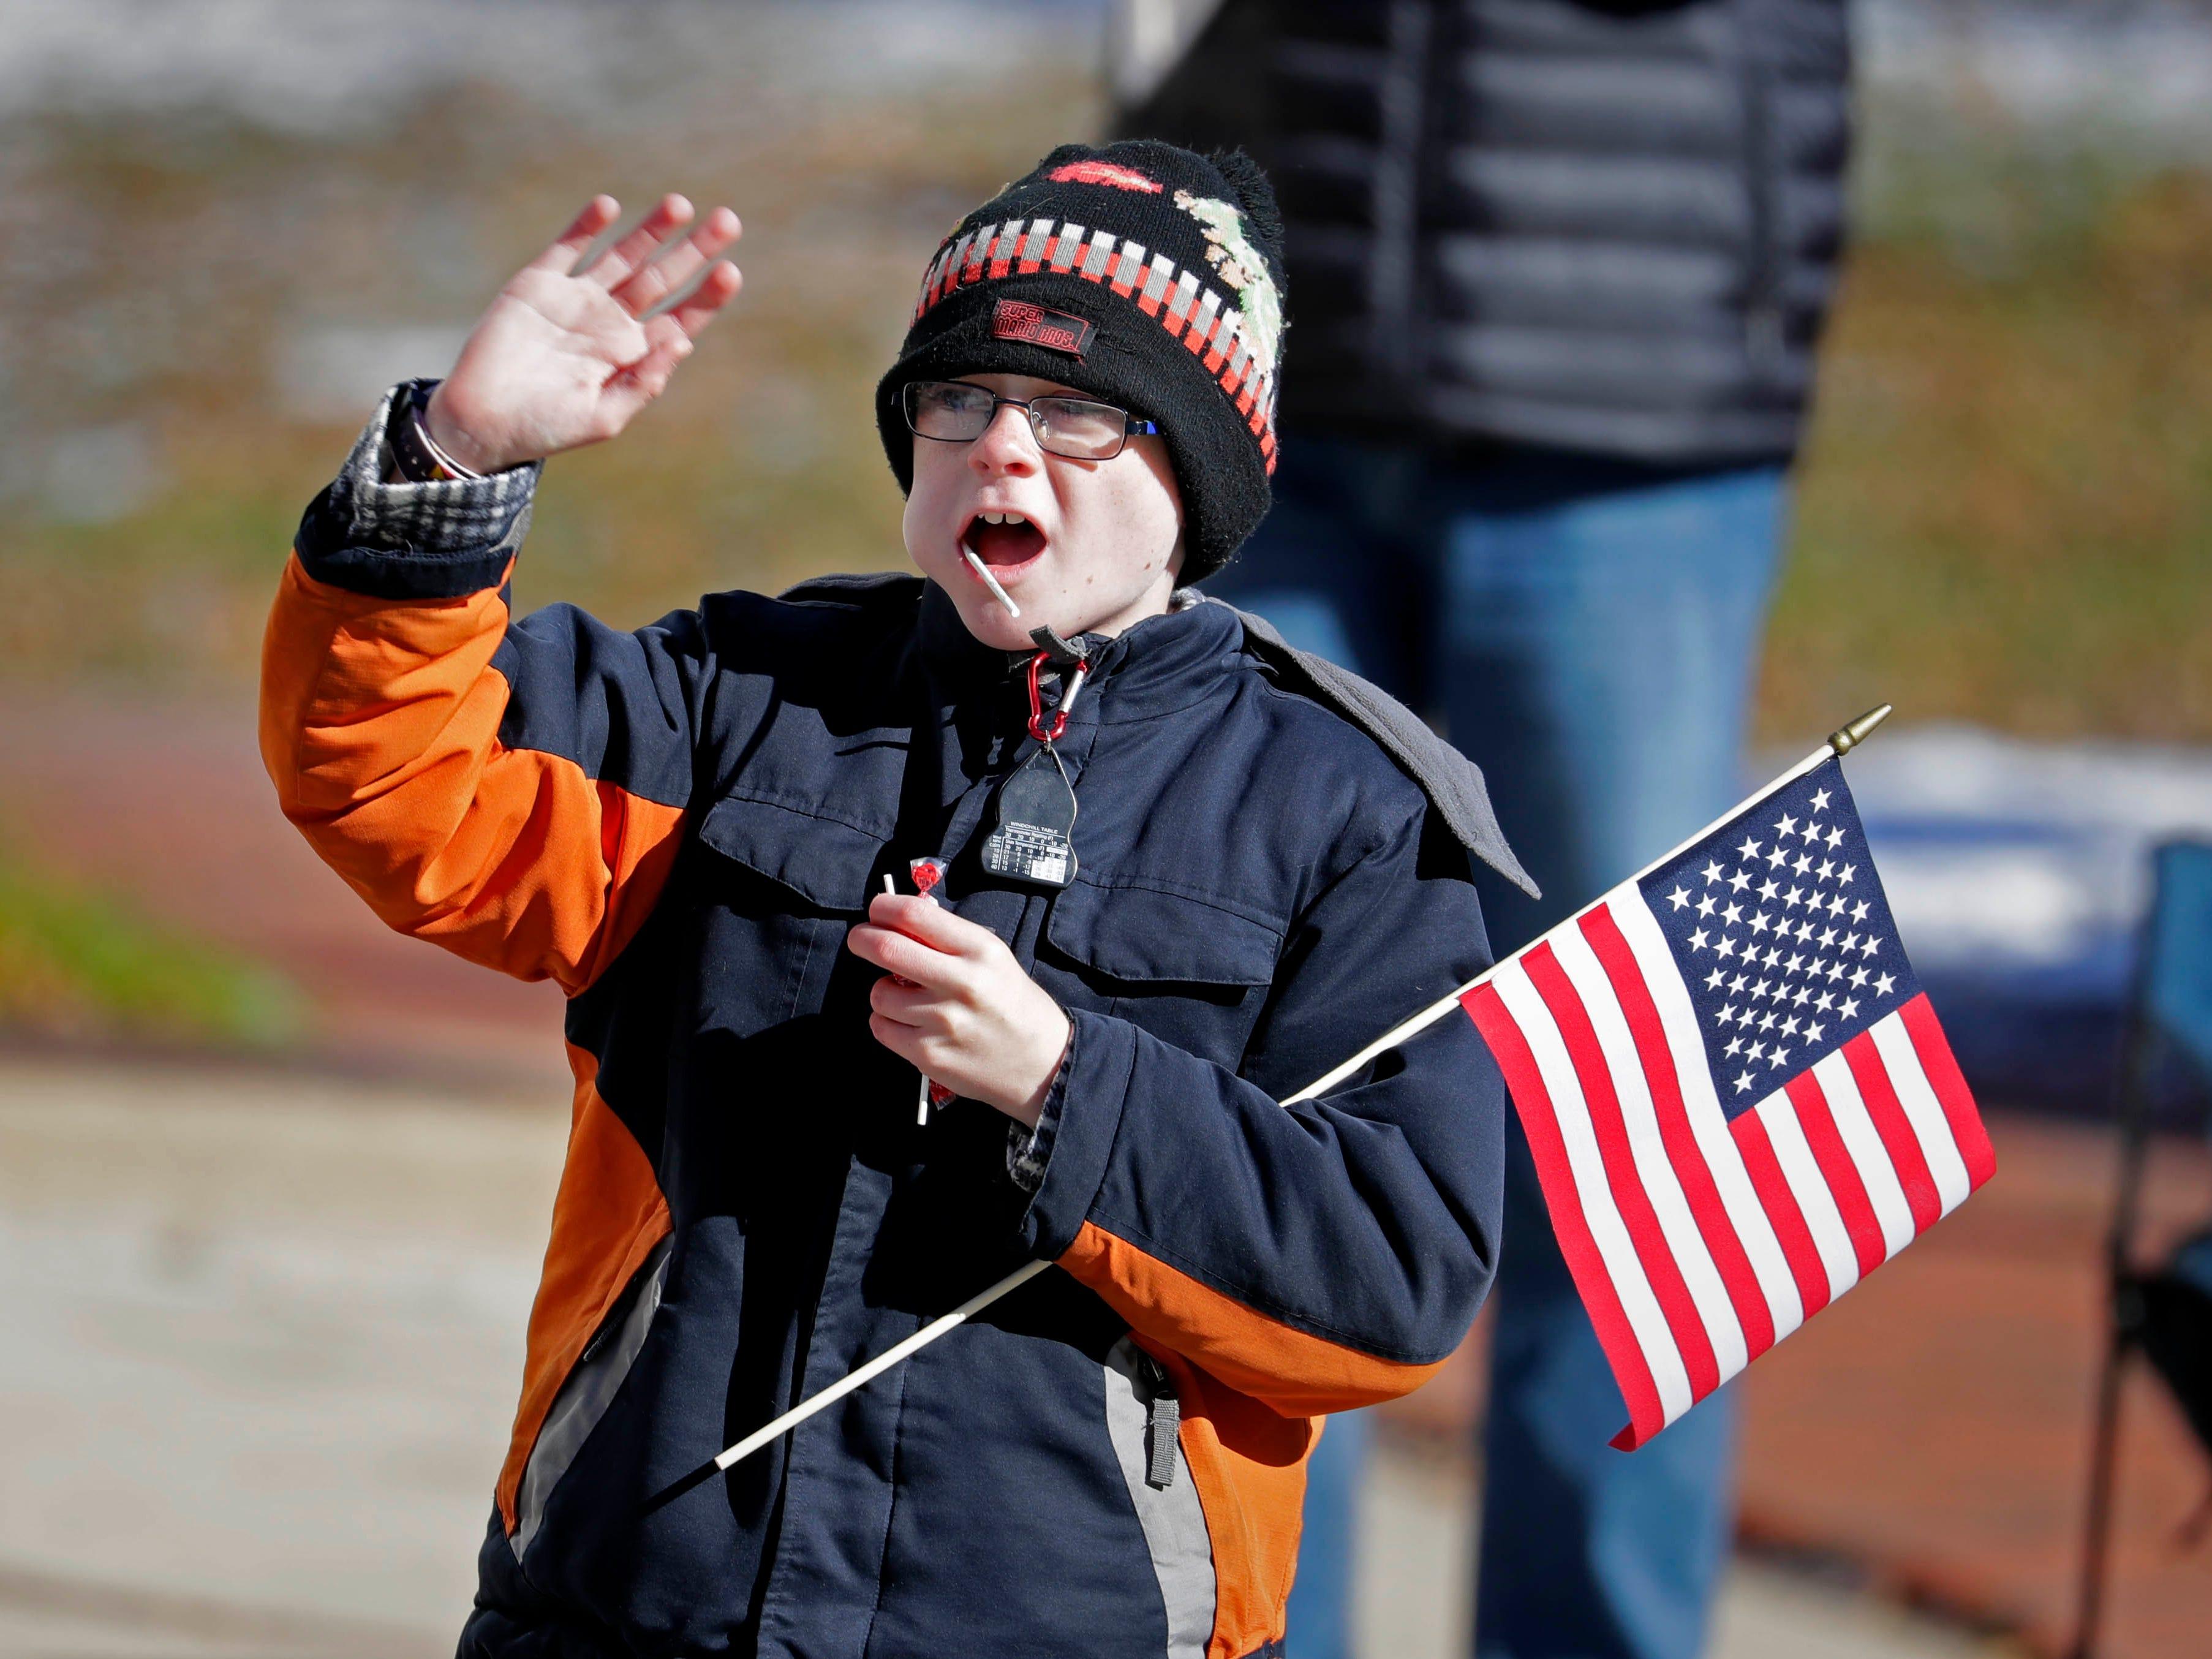 Wyatt Tietjen, 10, of Milwaukee waves to parade participants.